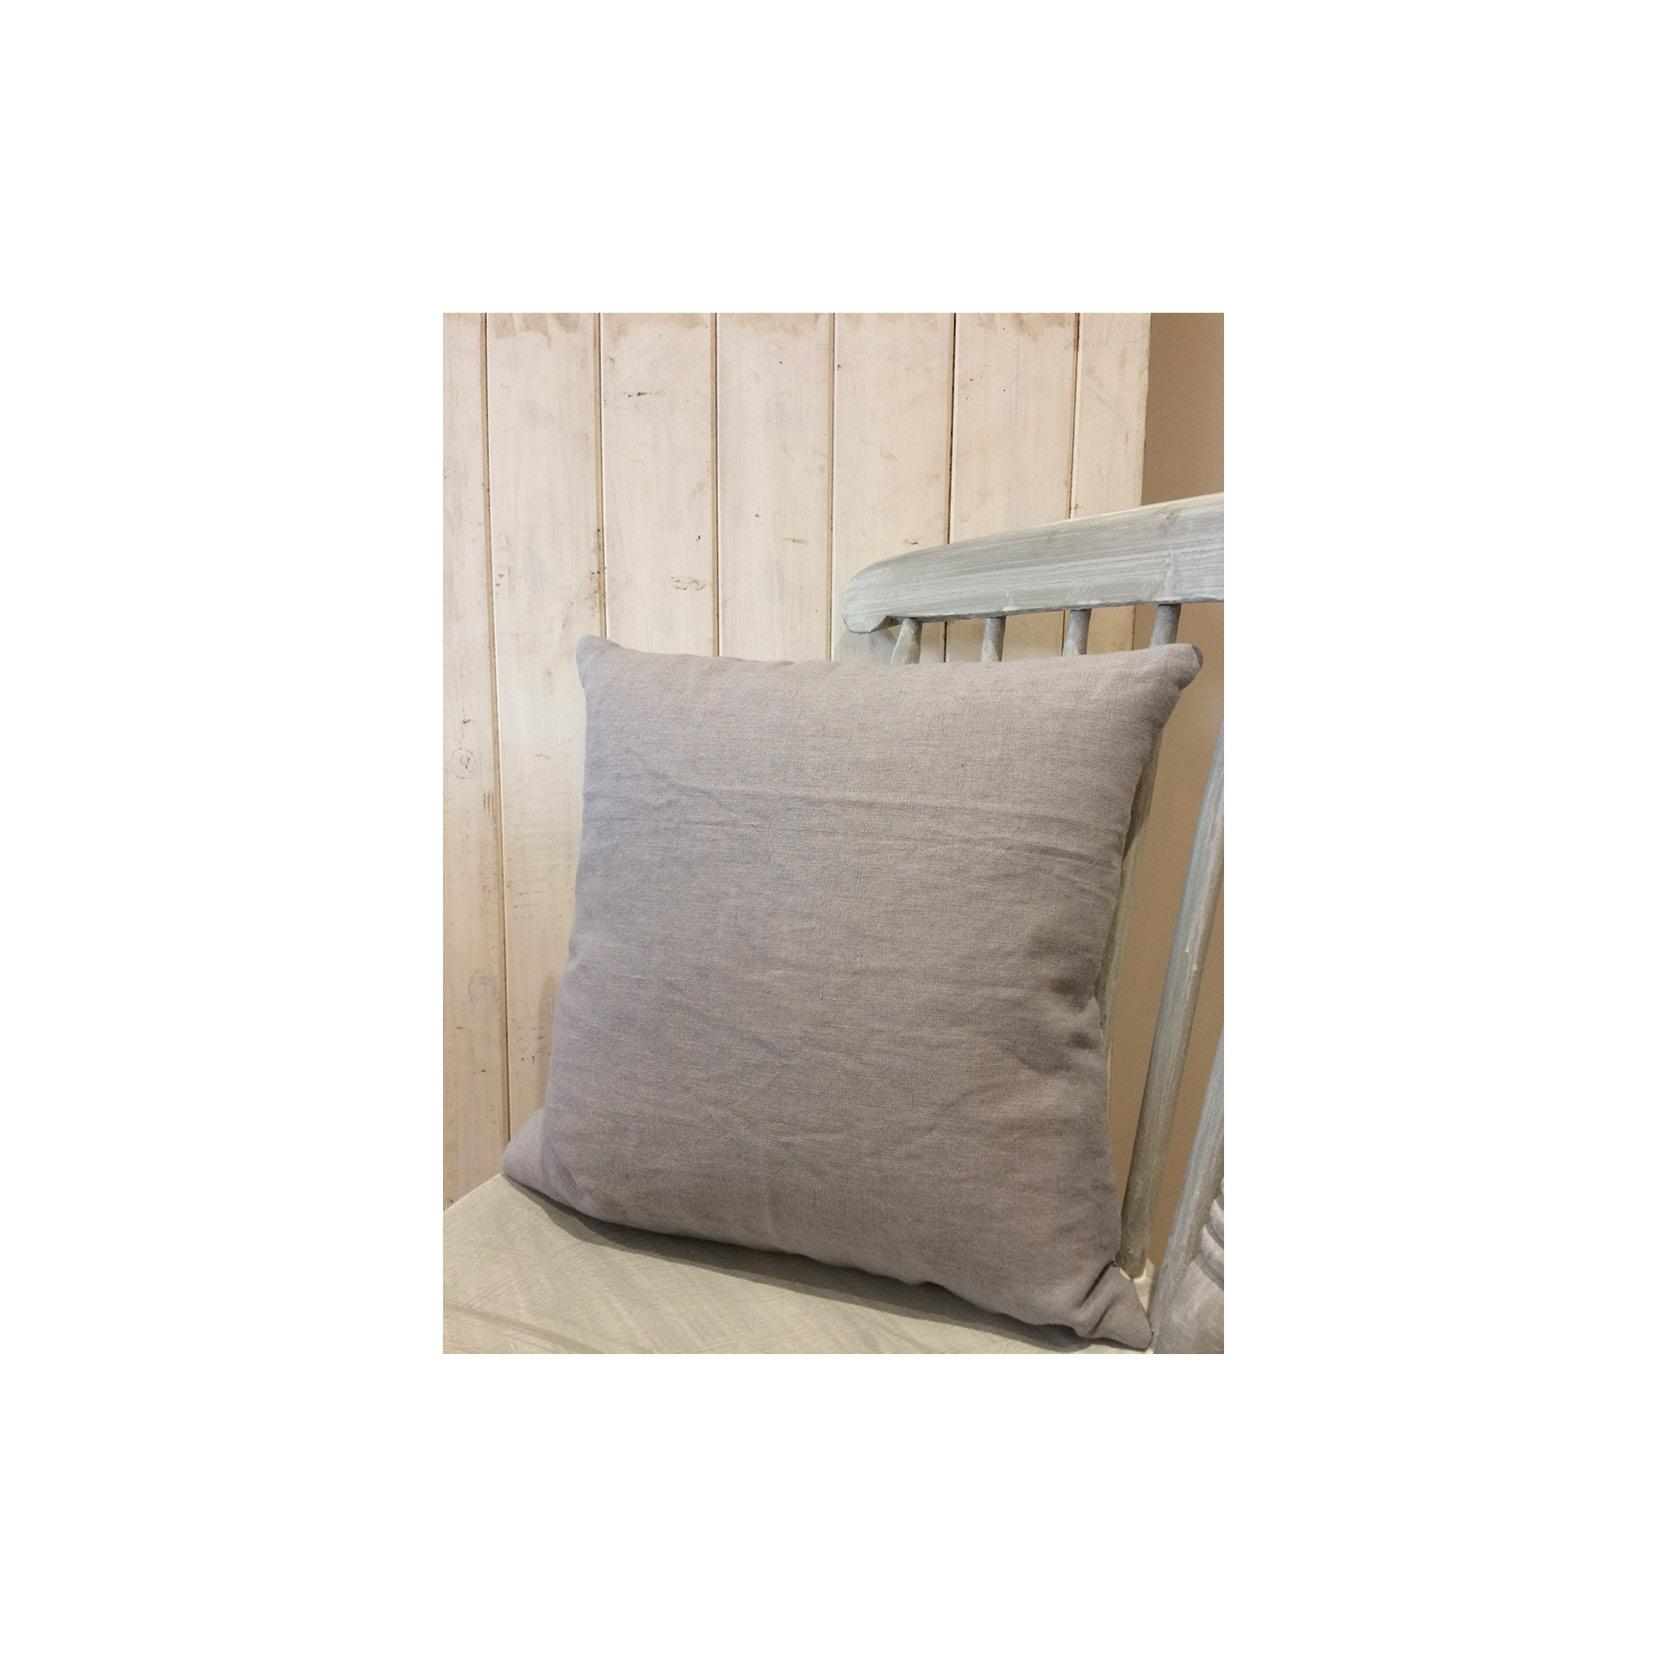 Pebble & Stripe - Pale Blue Ticking Cushion